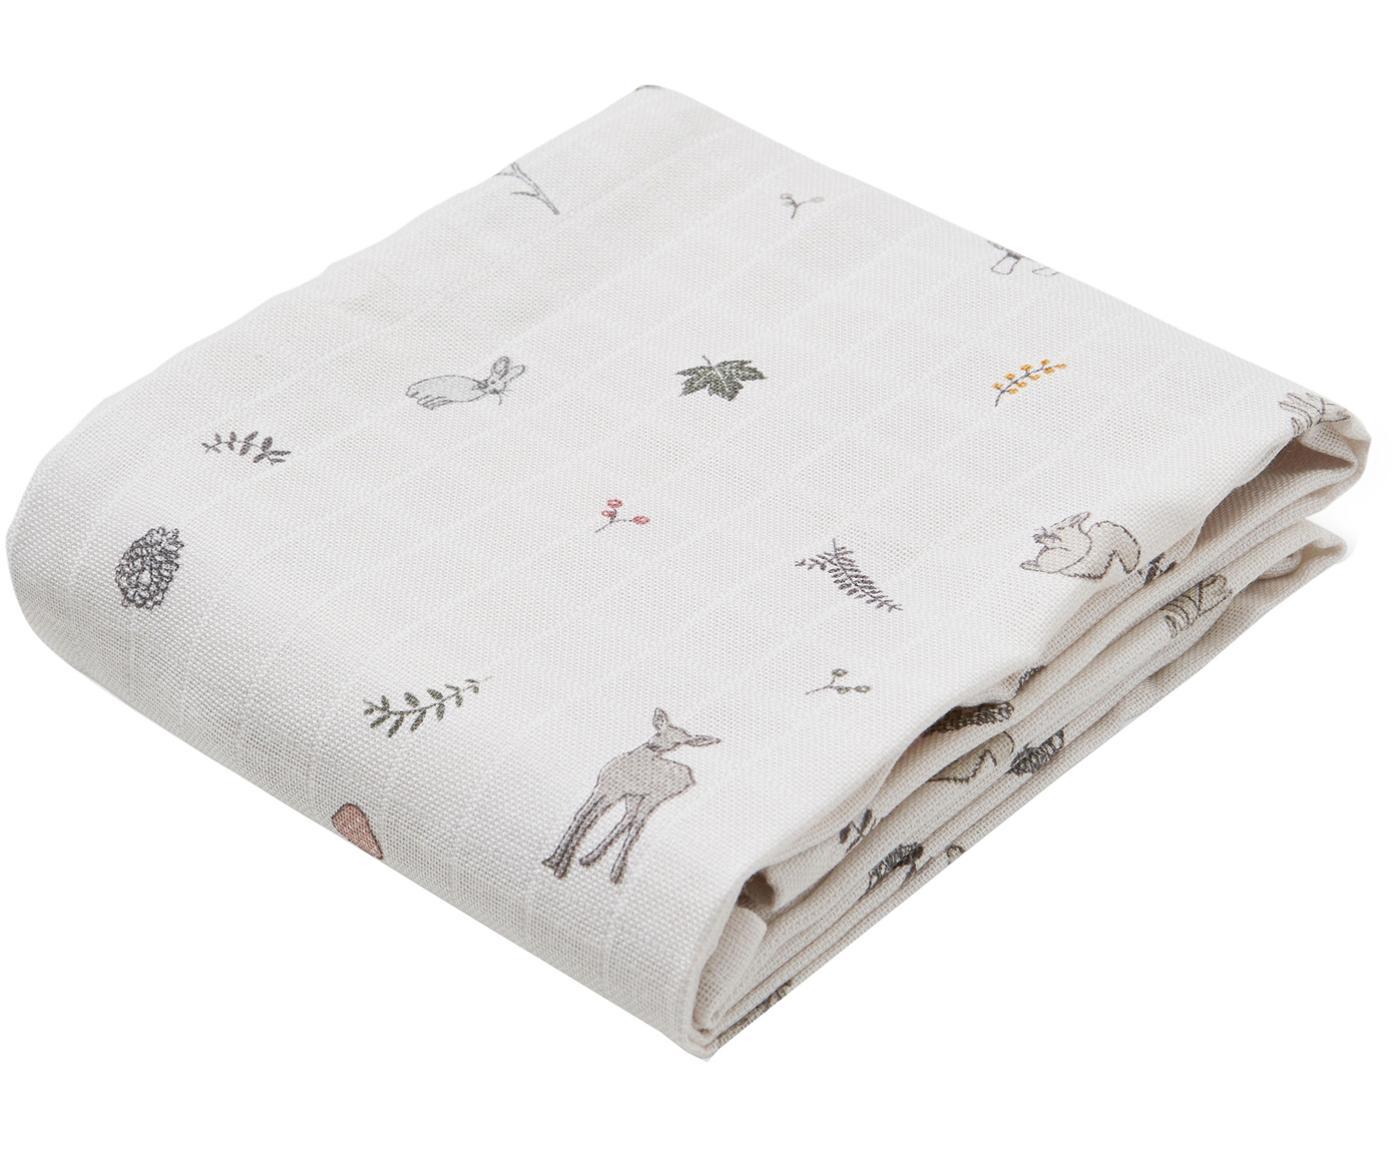 Mulltücher Fawn aus Bio-Baumwolle, 2 Stück, Bio-Baumwolle, GOTS-zertifiziert, Weiss, Braun, Beige, Gelb, Rosa, Grün, 70 x 70 cm